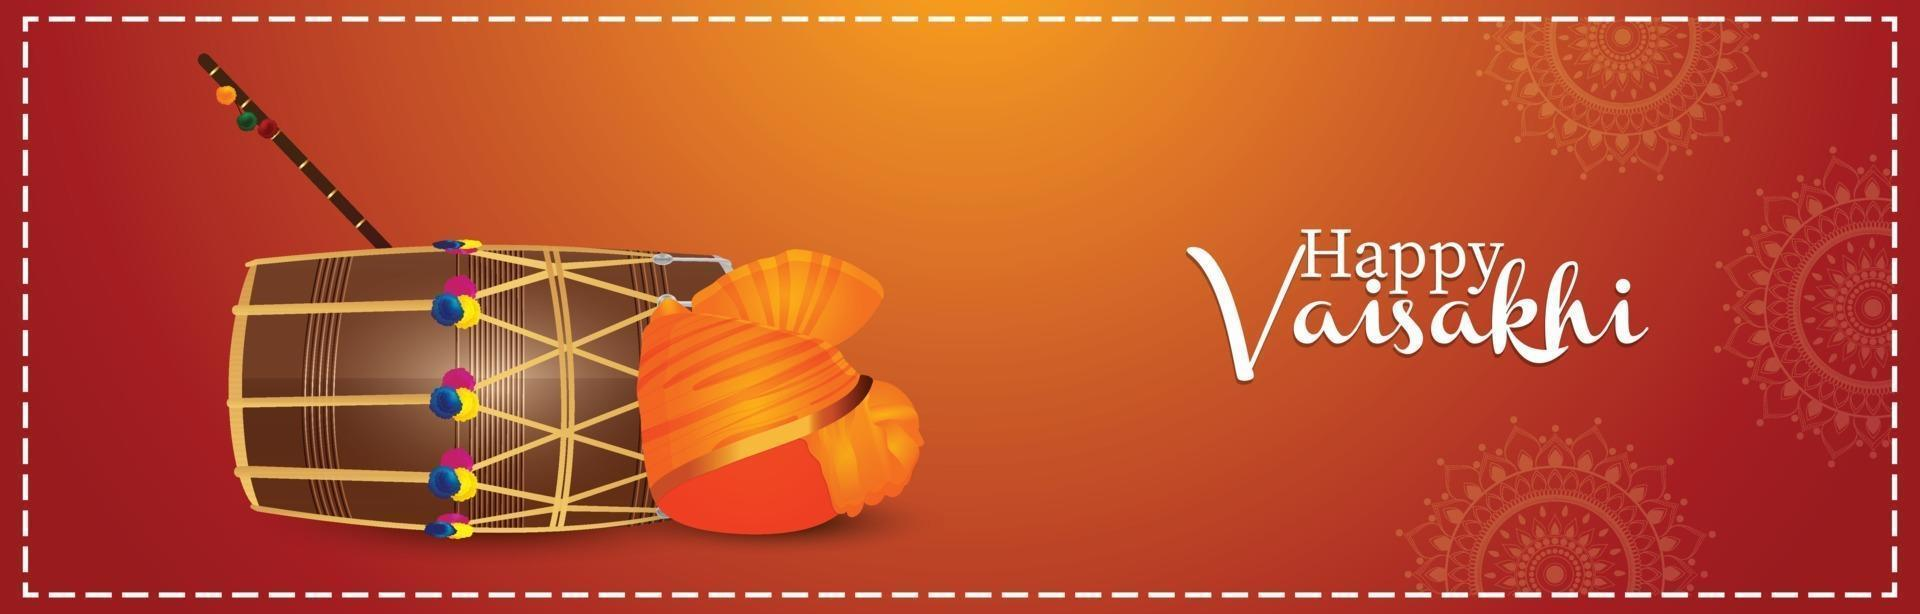 glad vaisakhi firande banner eller rubrik vektor